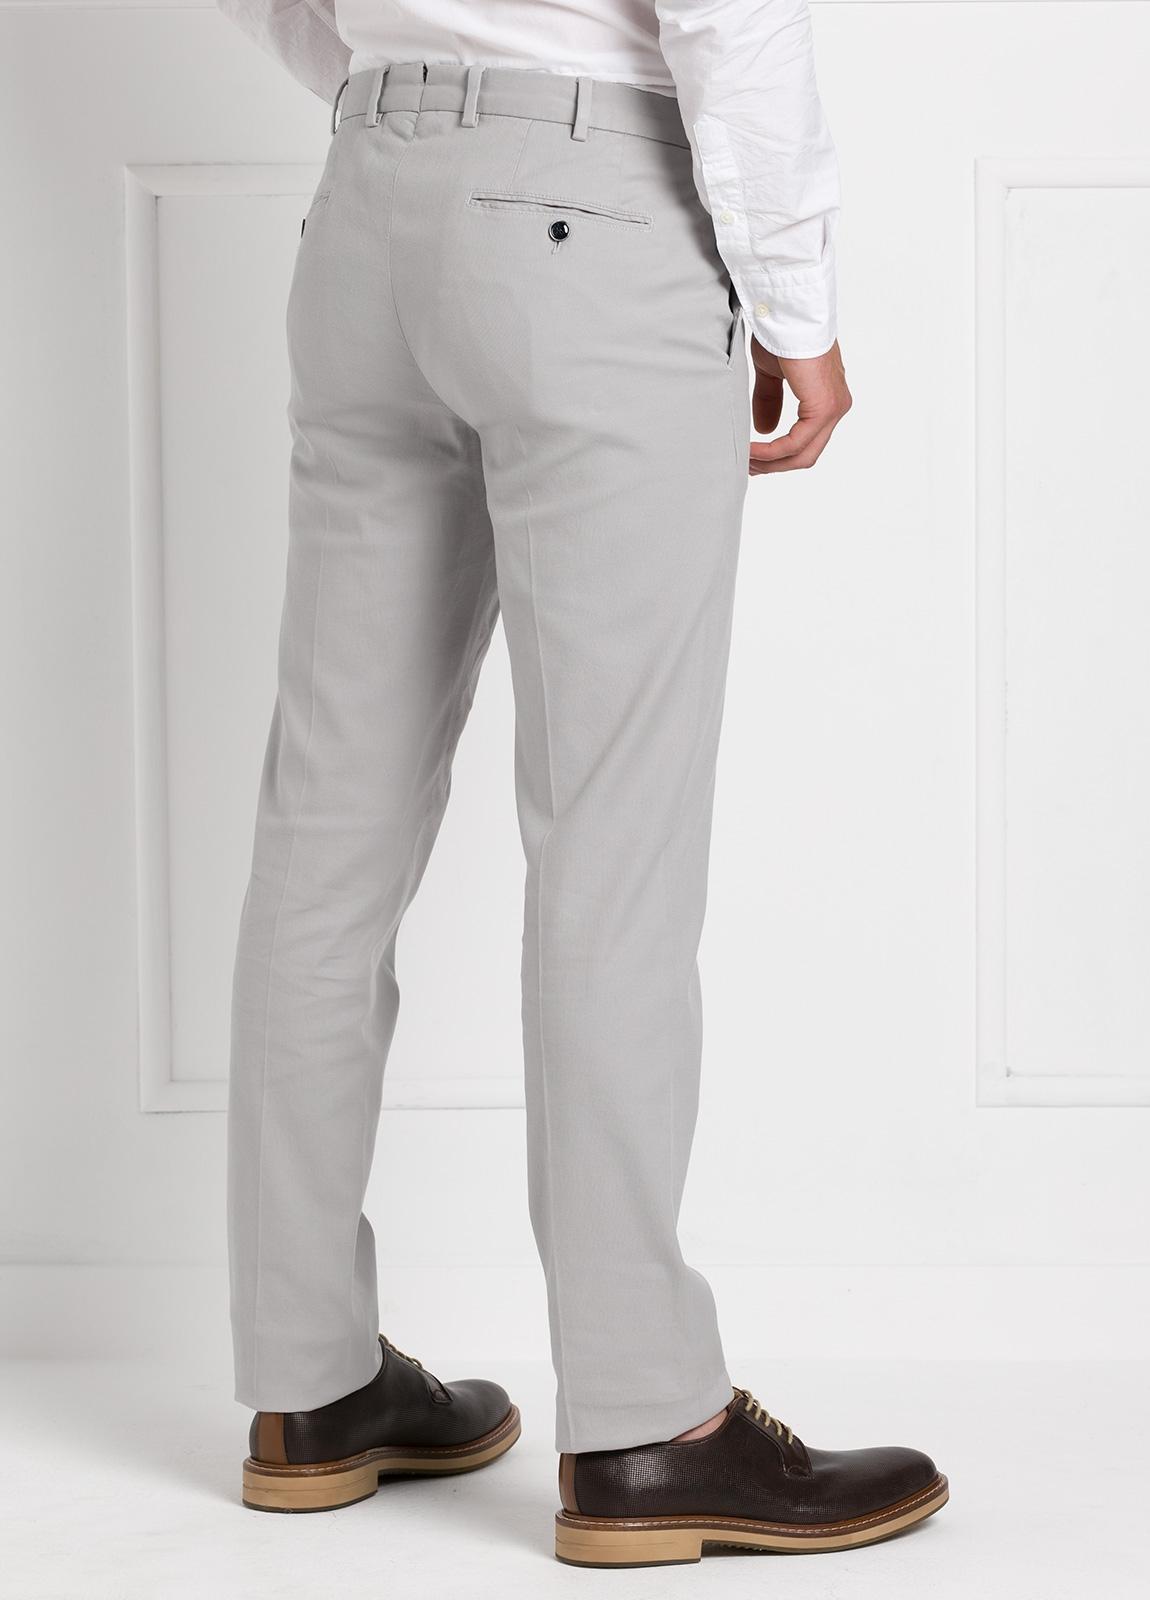 Pantalón chino modelo SANTA color gris perla. 97% Algodón 3% Elastán. - Ítem3